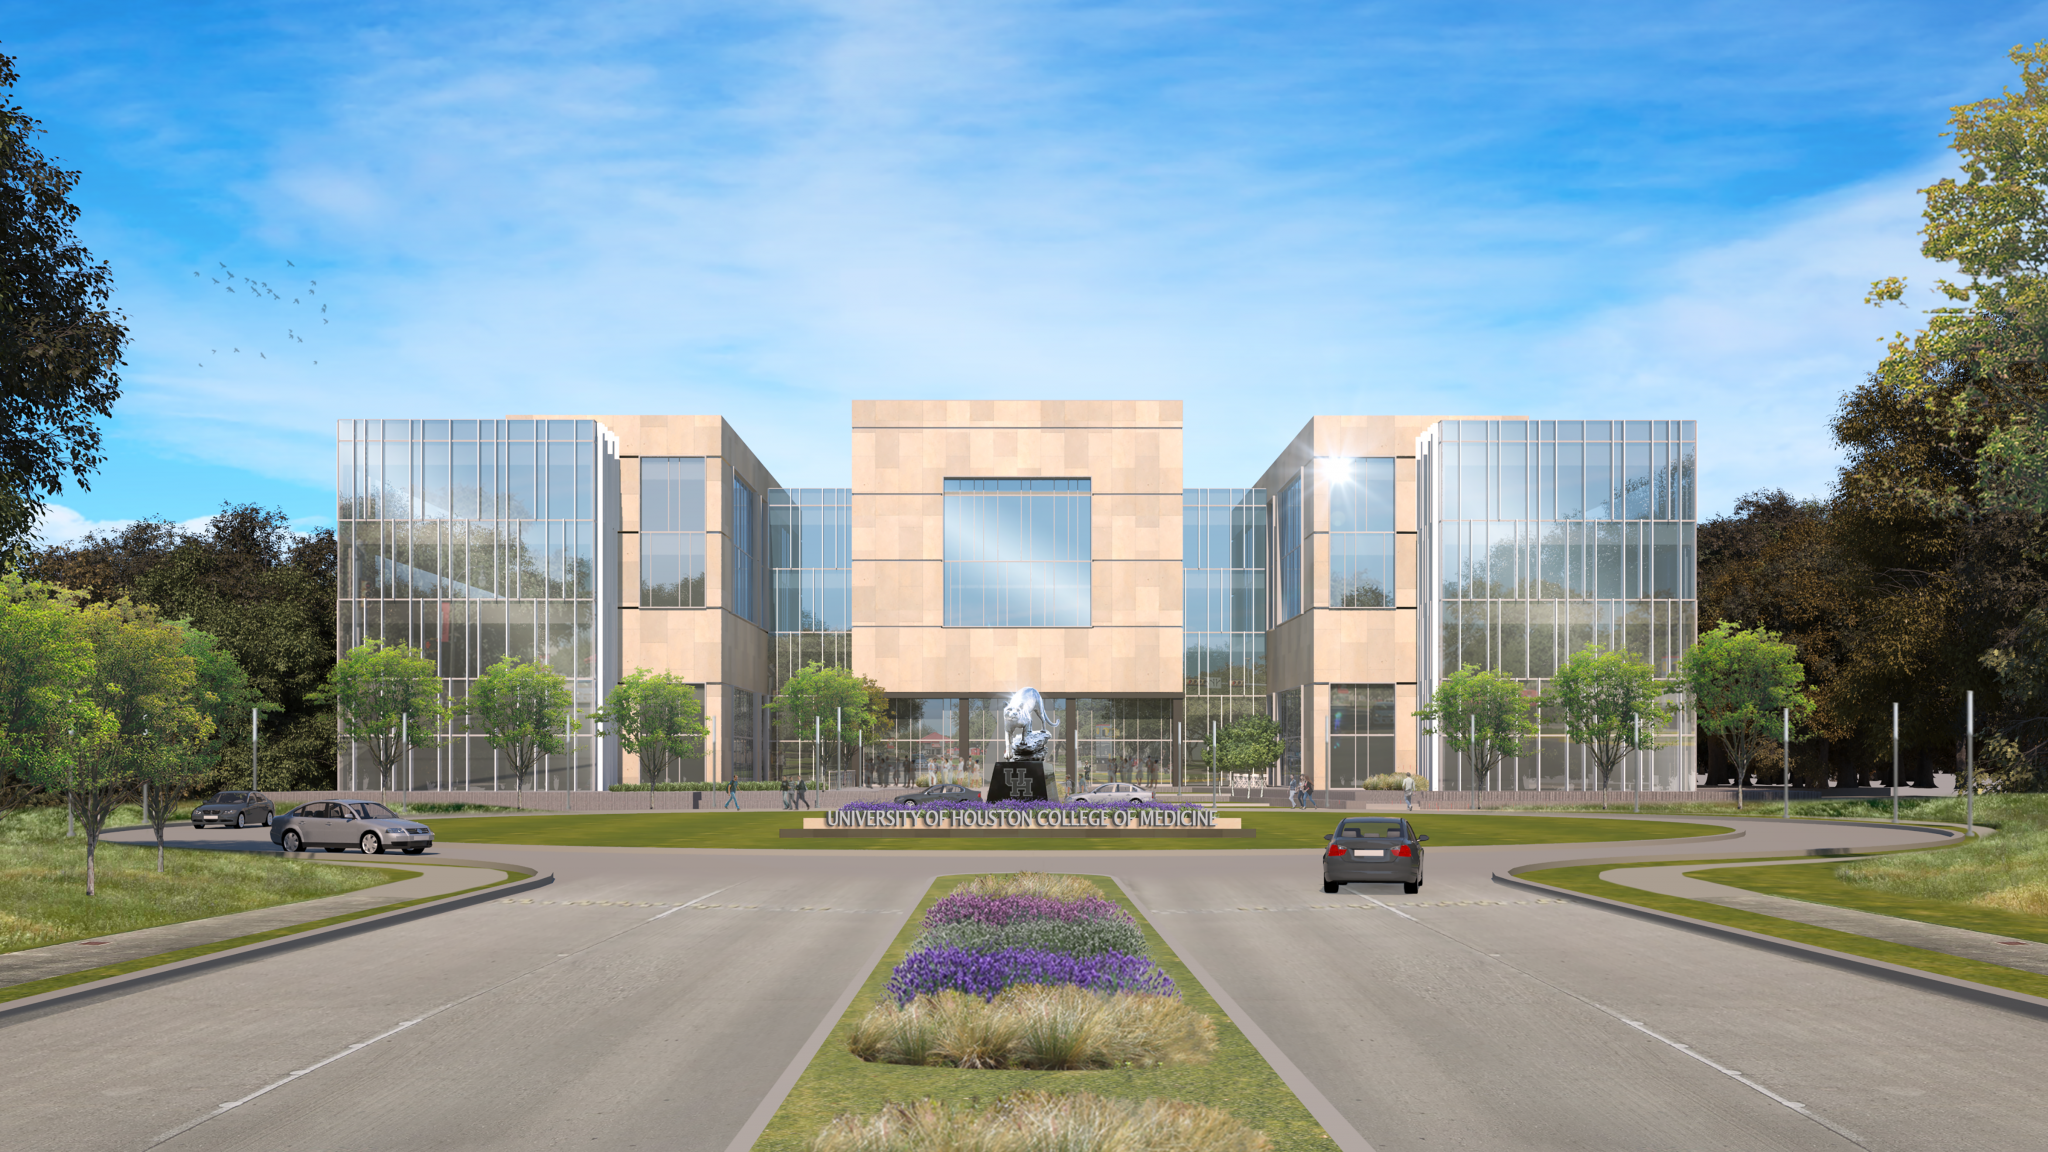 UH to build modern, sleek medical school